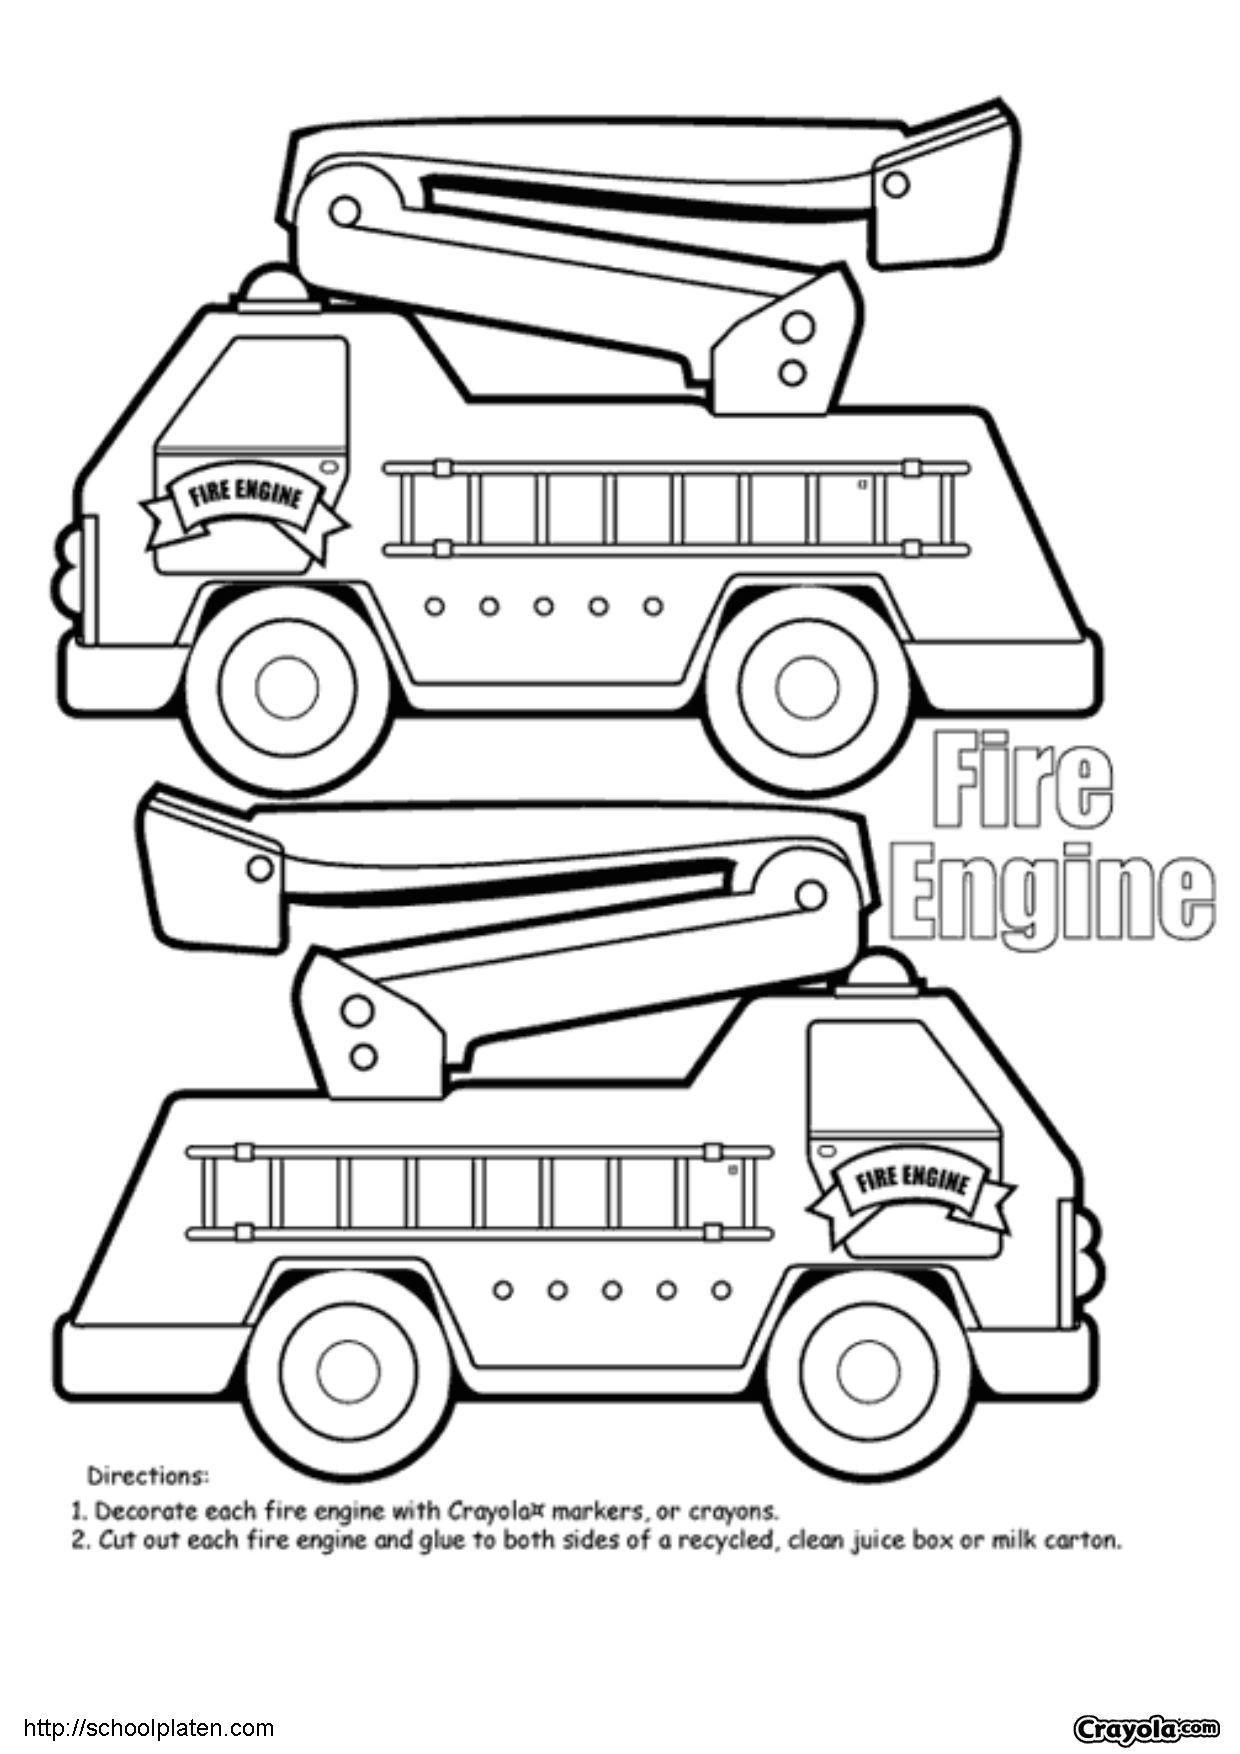 Brandweerauto With Images